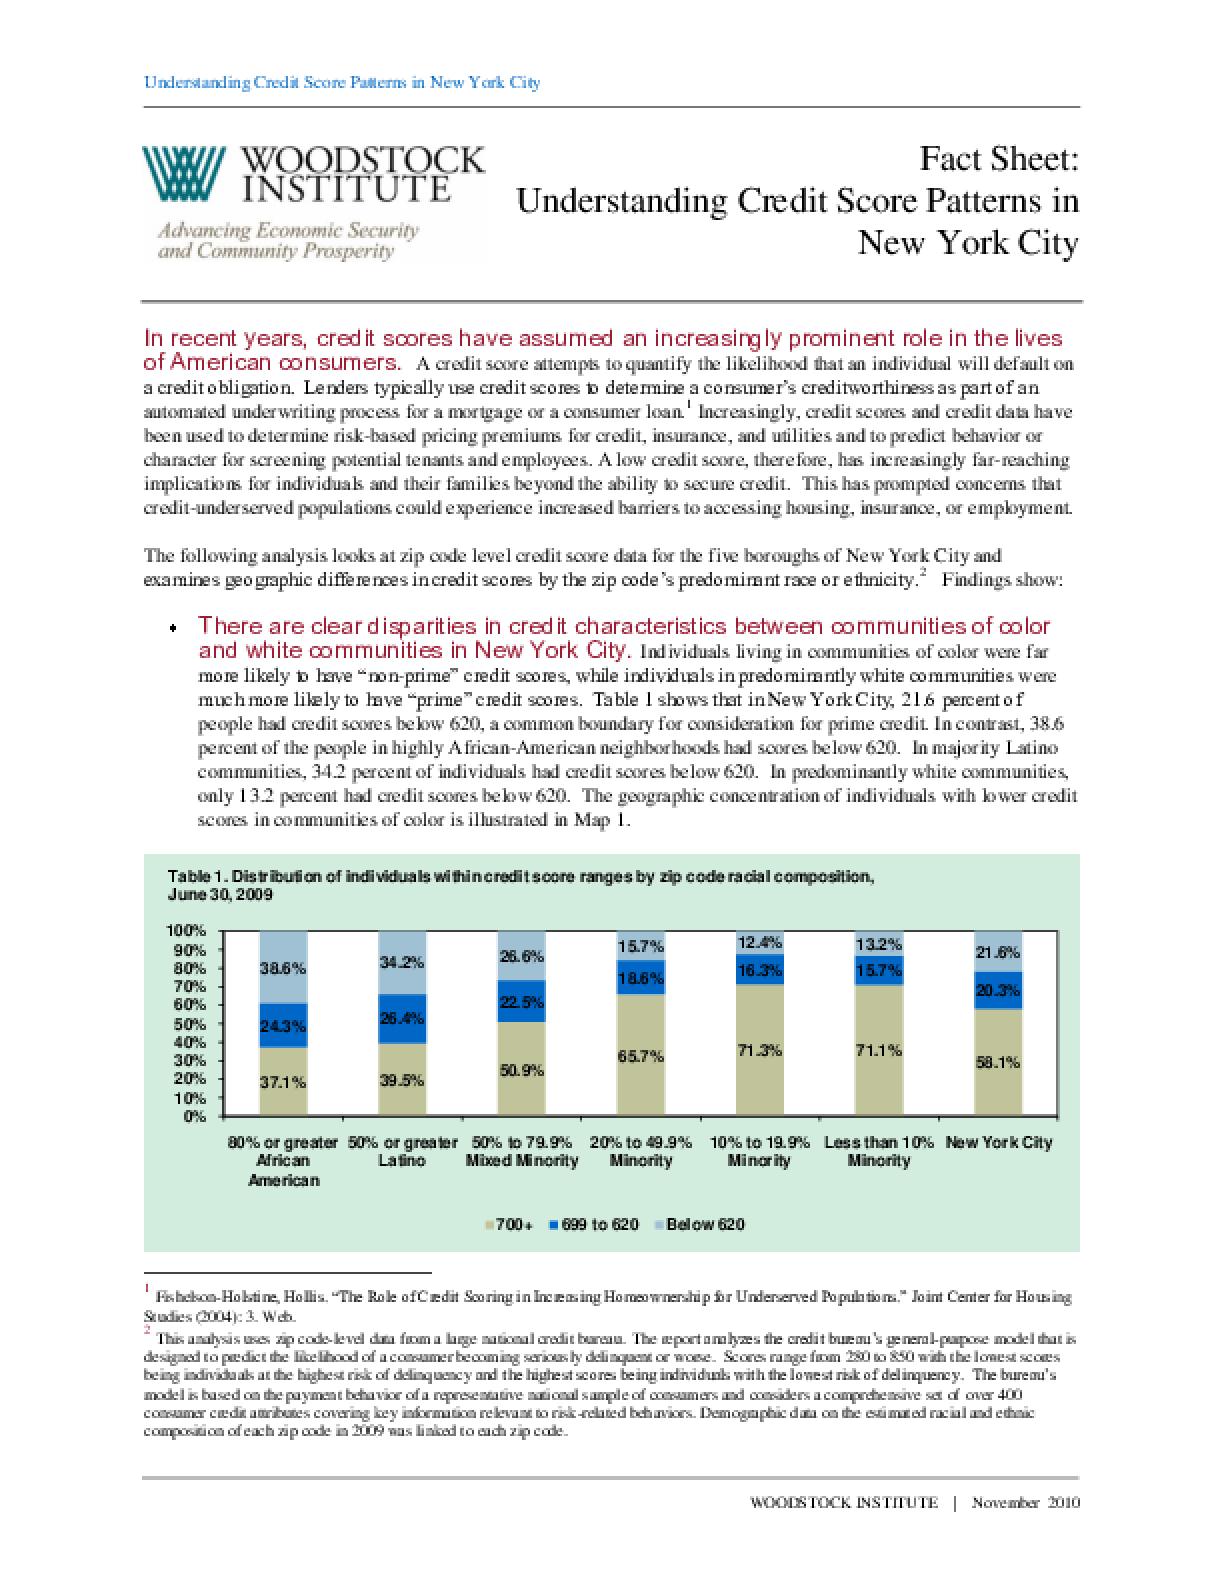 Fact Sheet: Understanding Credit Score Patterns in New York City